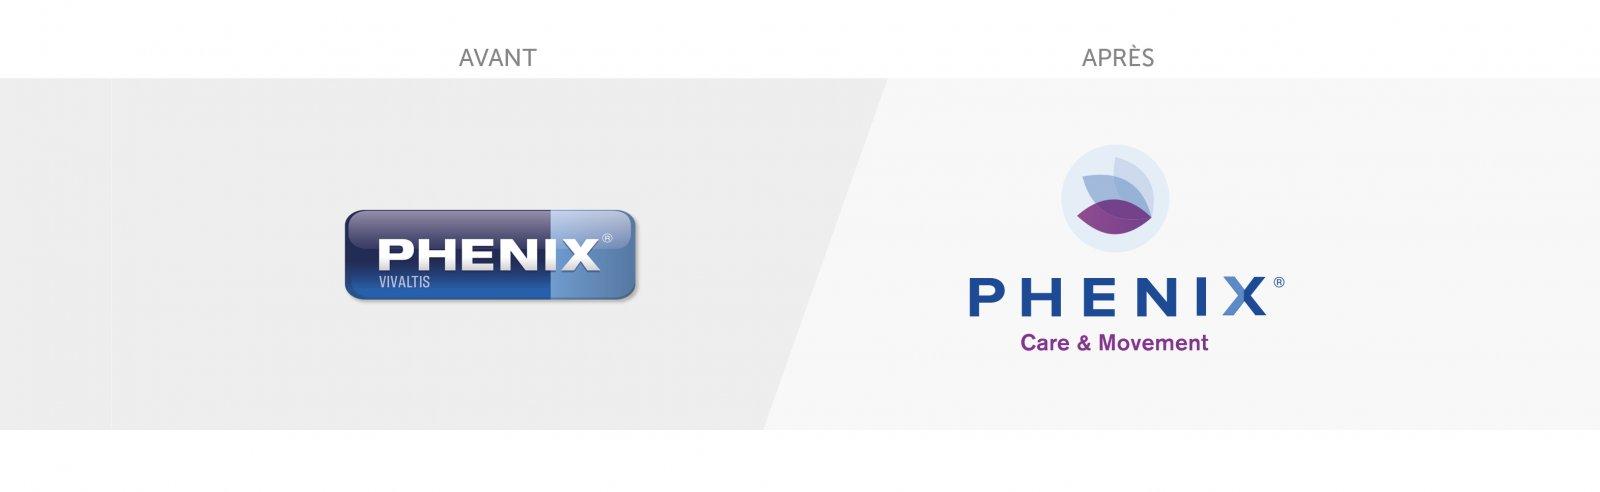 1633963264.logo.avant.apres.phenix.jpg